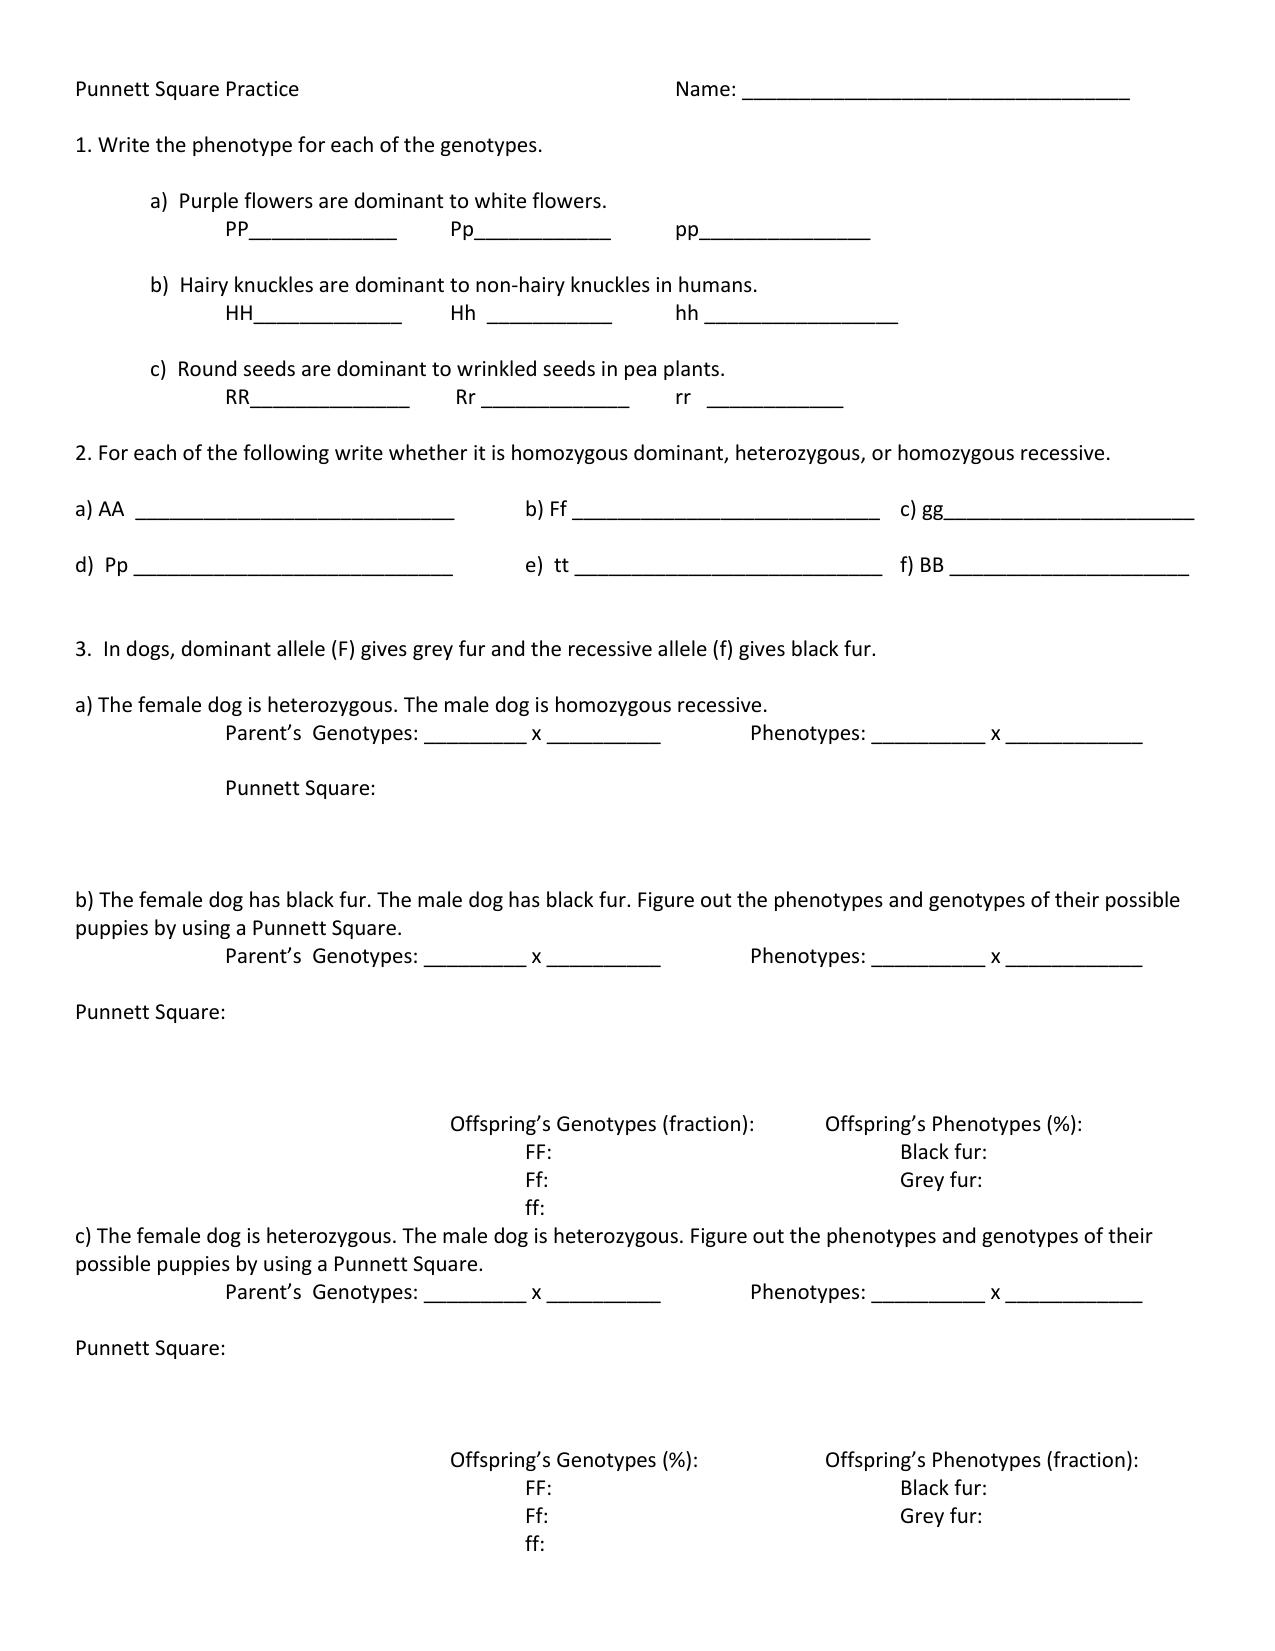 Worksheets Punnett Square Practice Worksheet With Answers worksheet punnett square practice answers fun worksheet